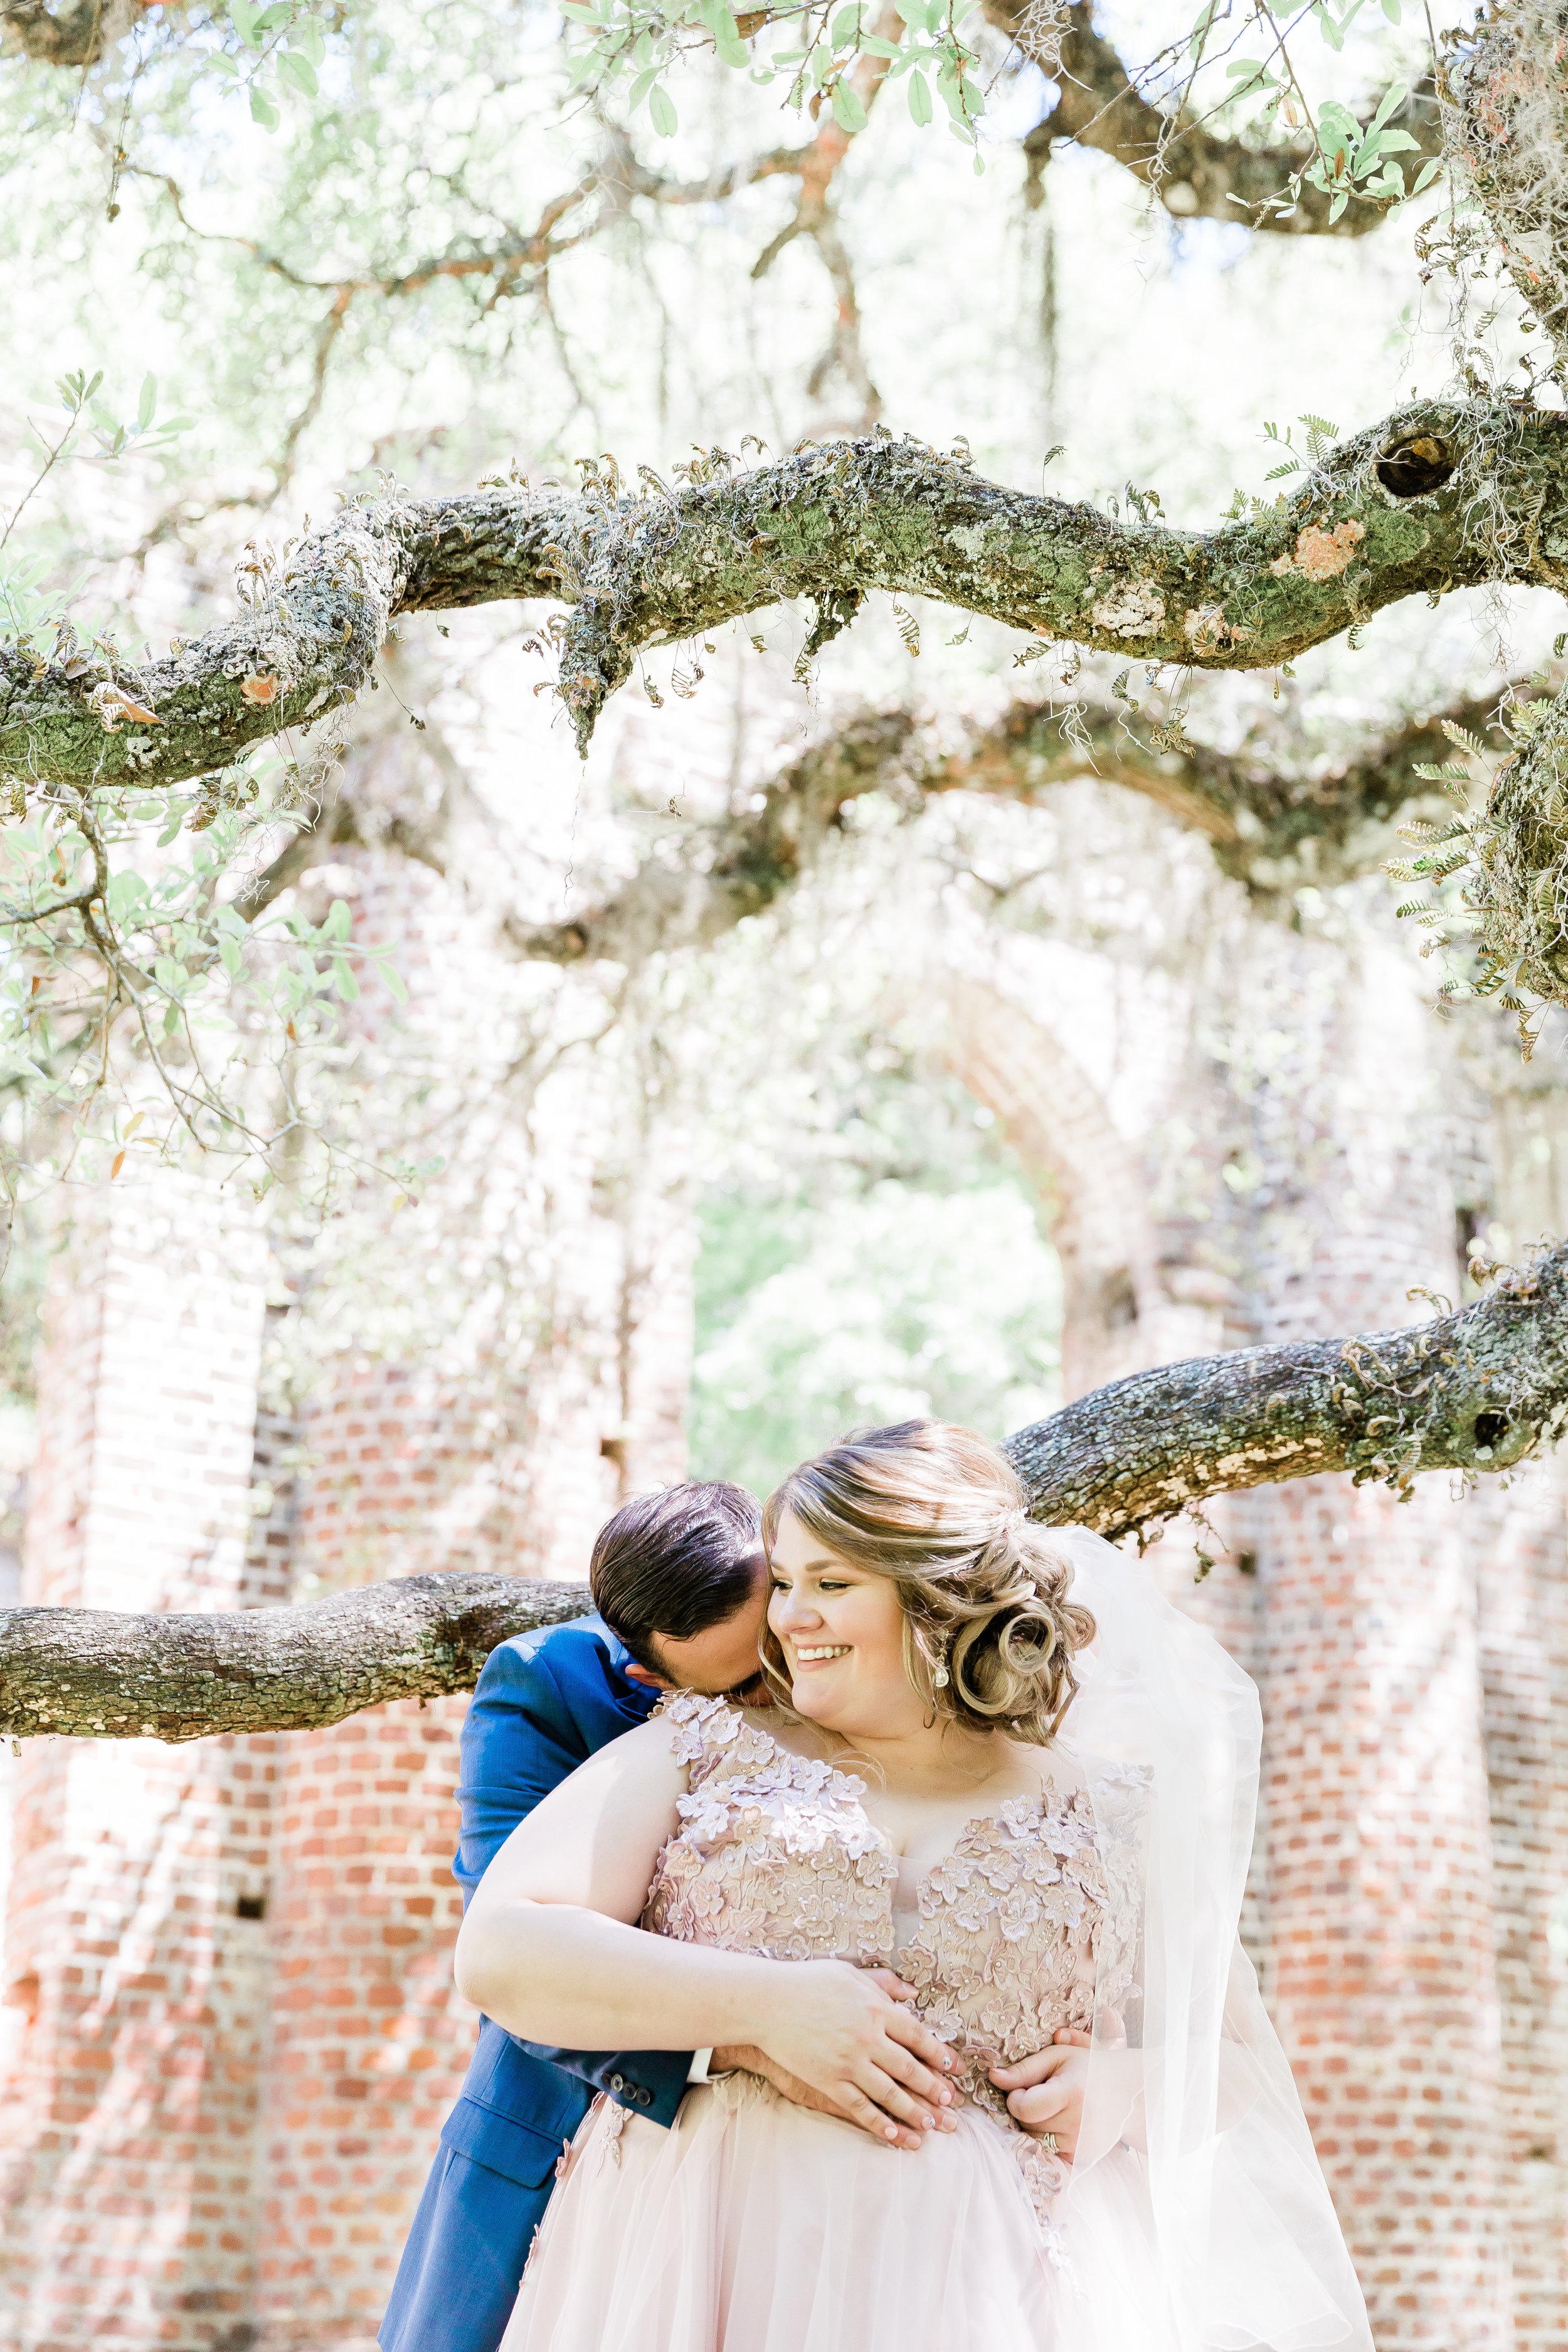 20190417-Southern Lens Photography-savannah family photographer- Ashley and Zack-old sheldon church ruins-201972.jpg